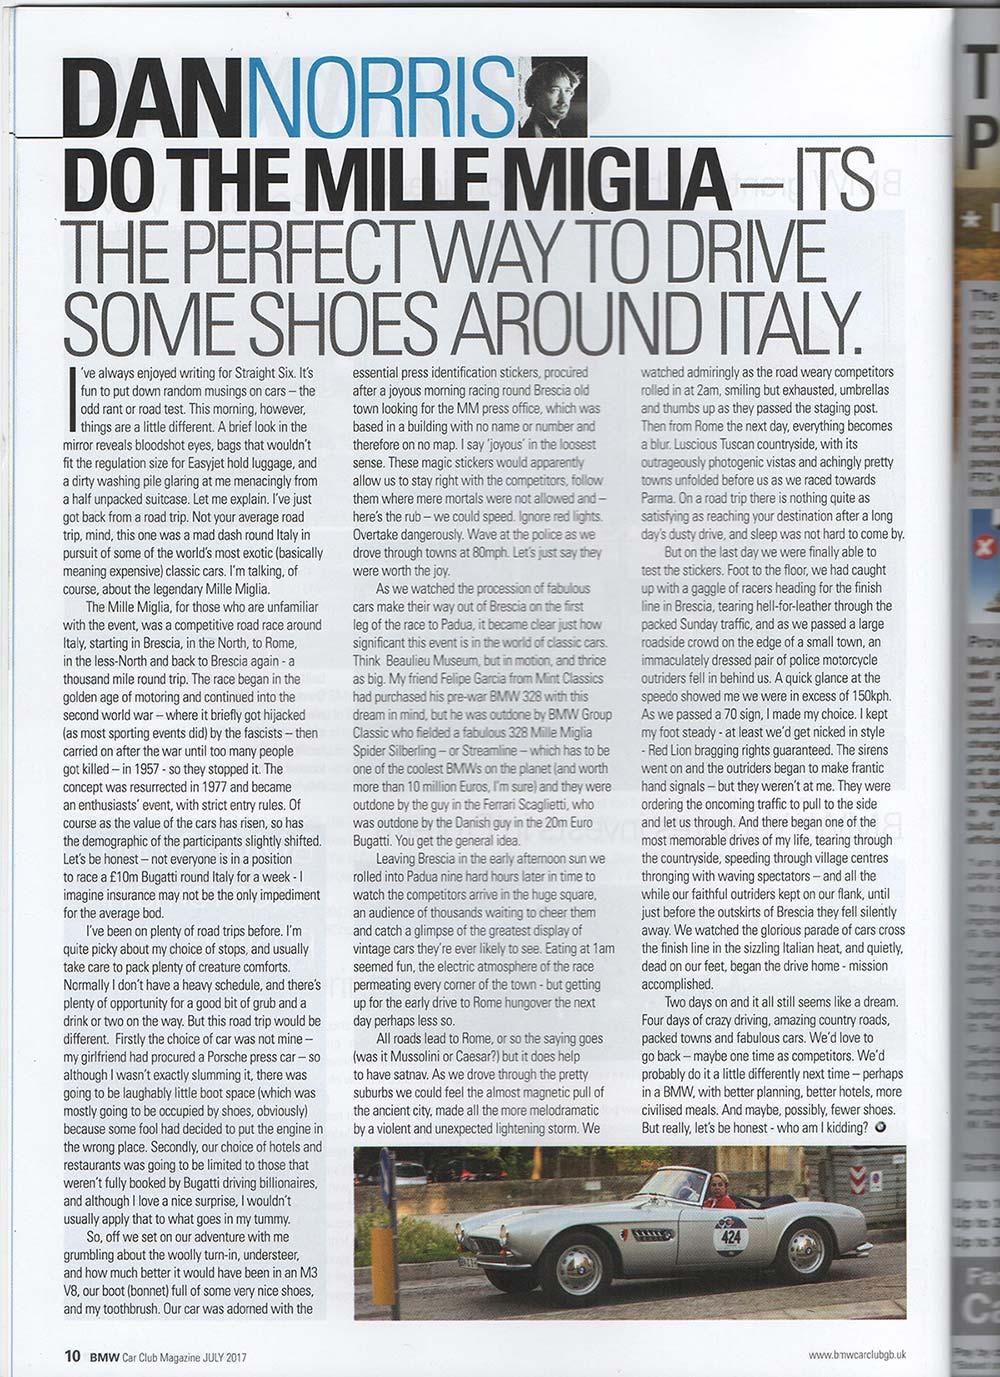 Mille Miglia 2017 - Dan Norris / BMW Car